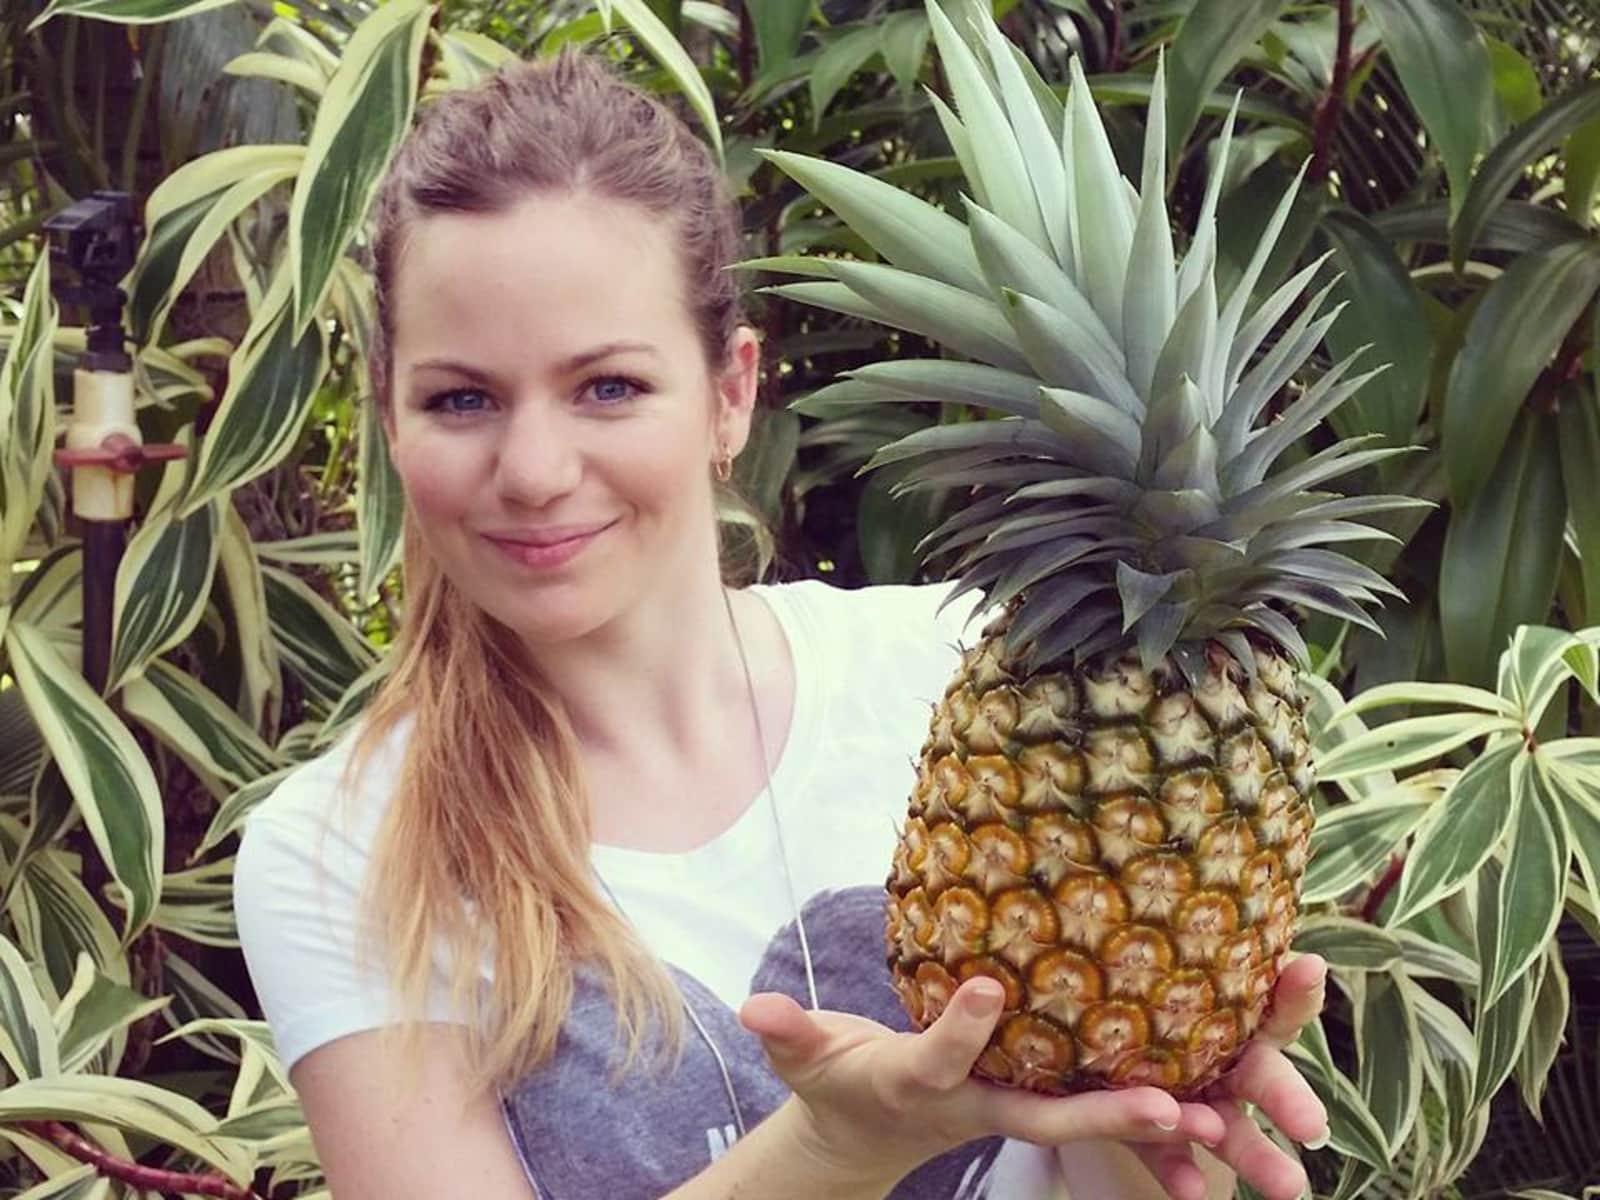 Emily from Kiama, New South Wales, Australia